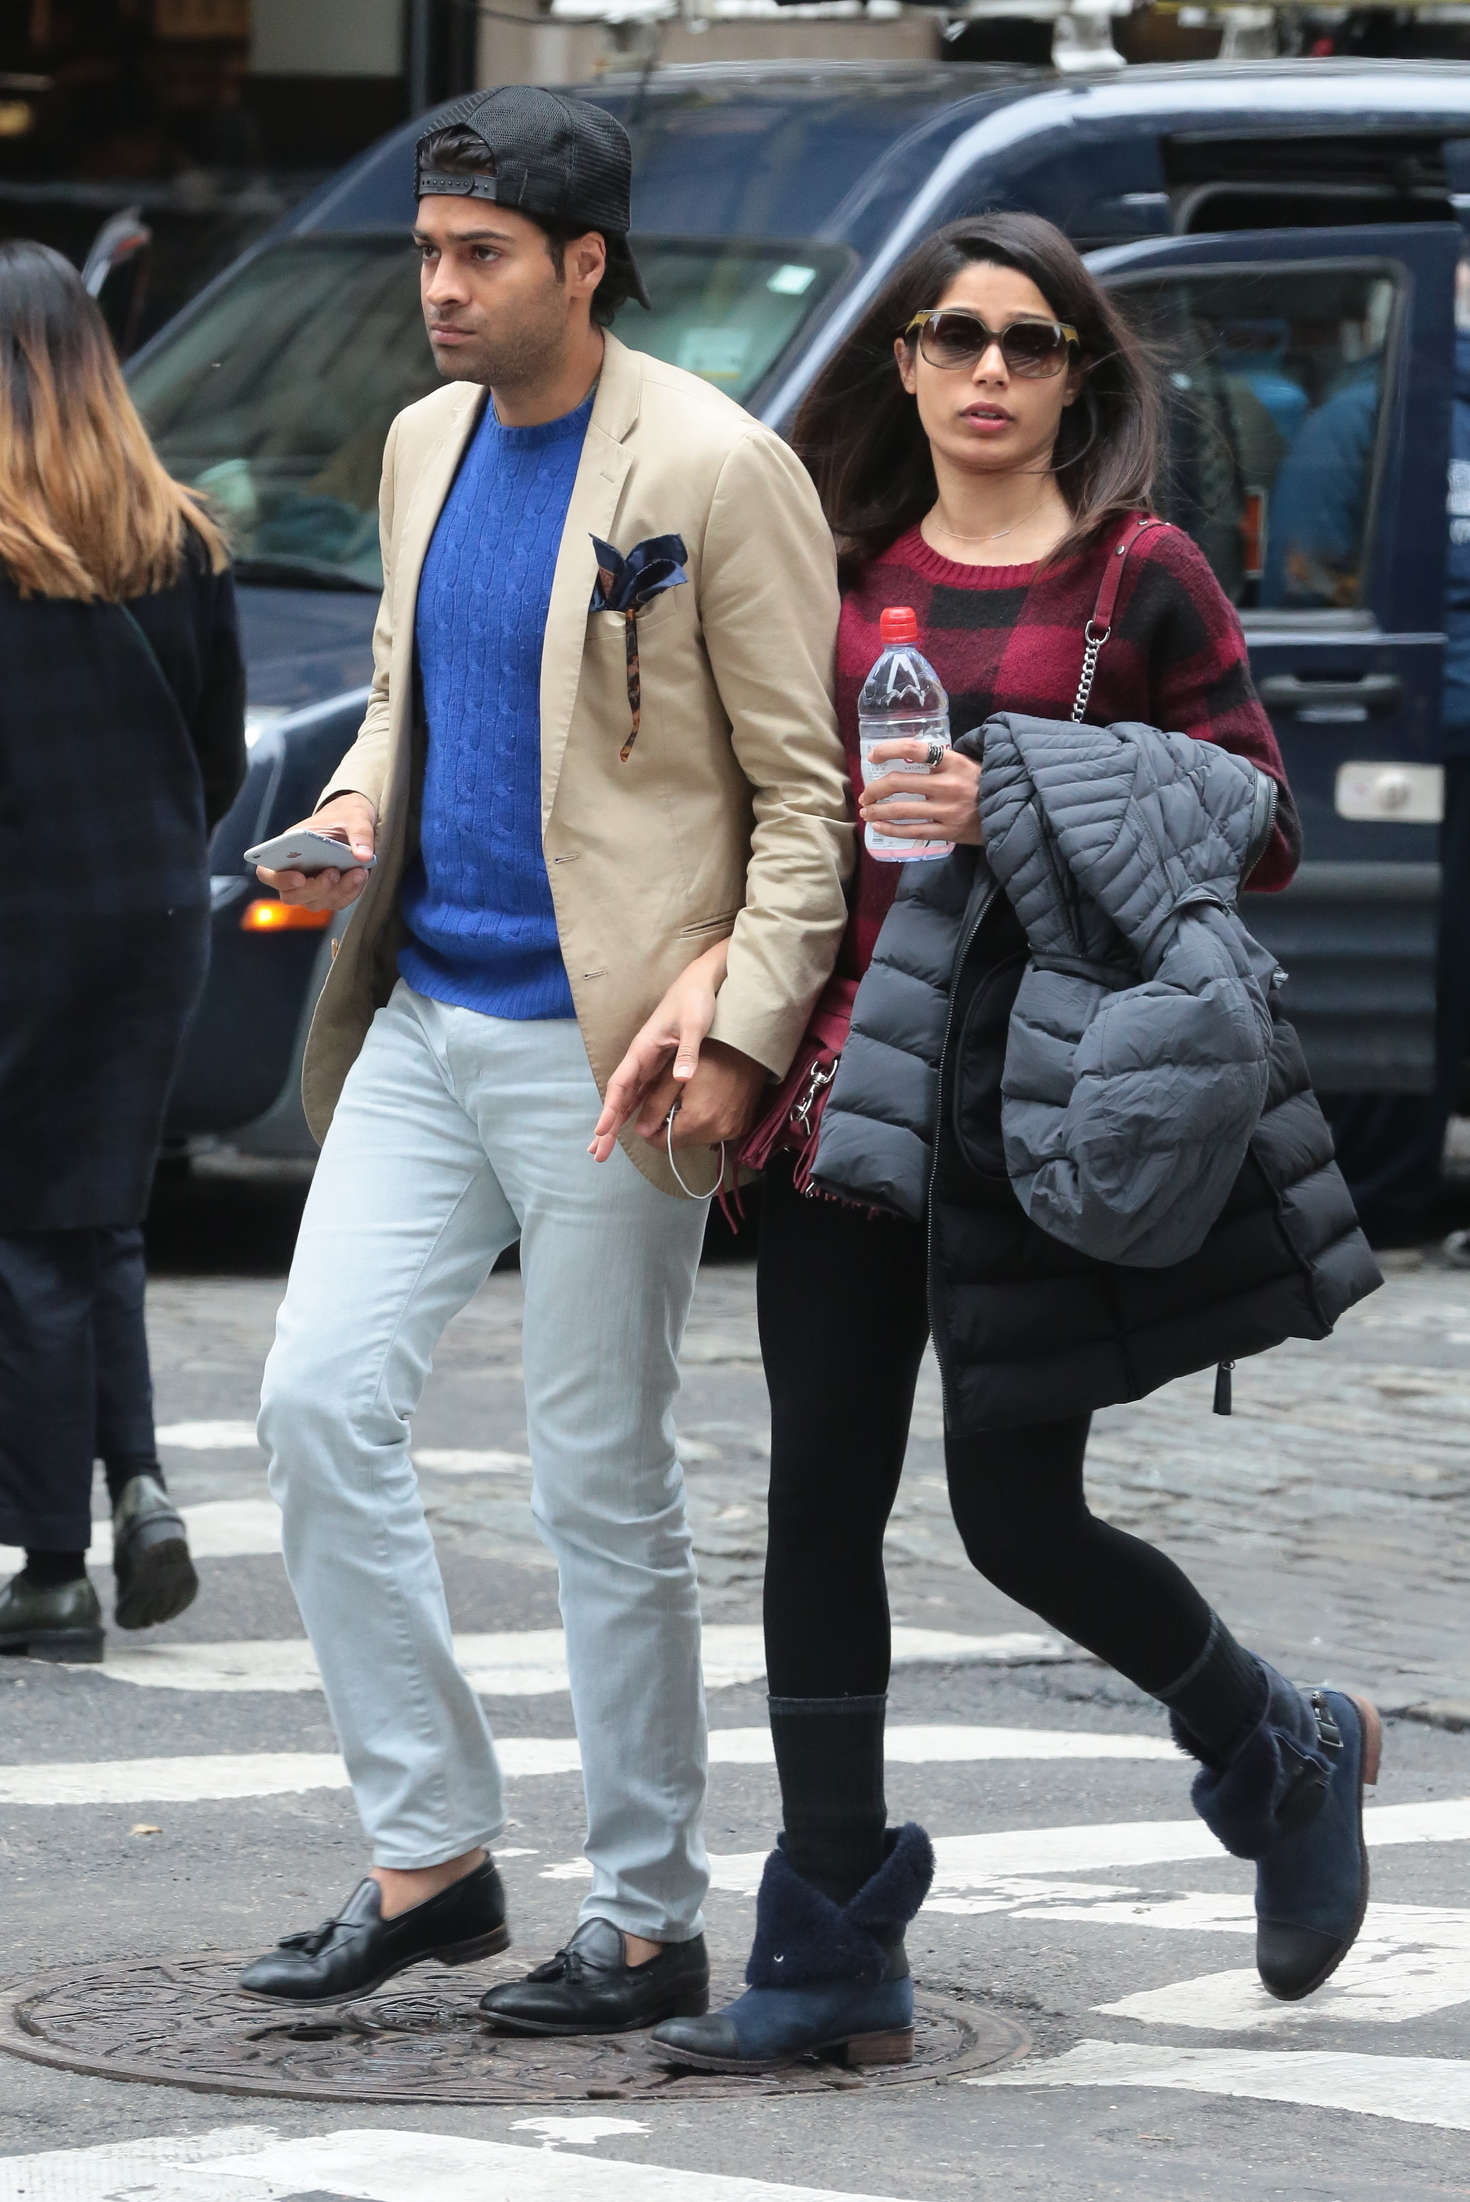 Freida Pinto and her boyfriend out in New York -01 – GotCeleb